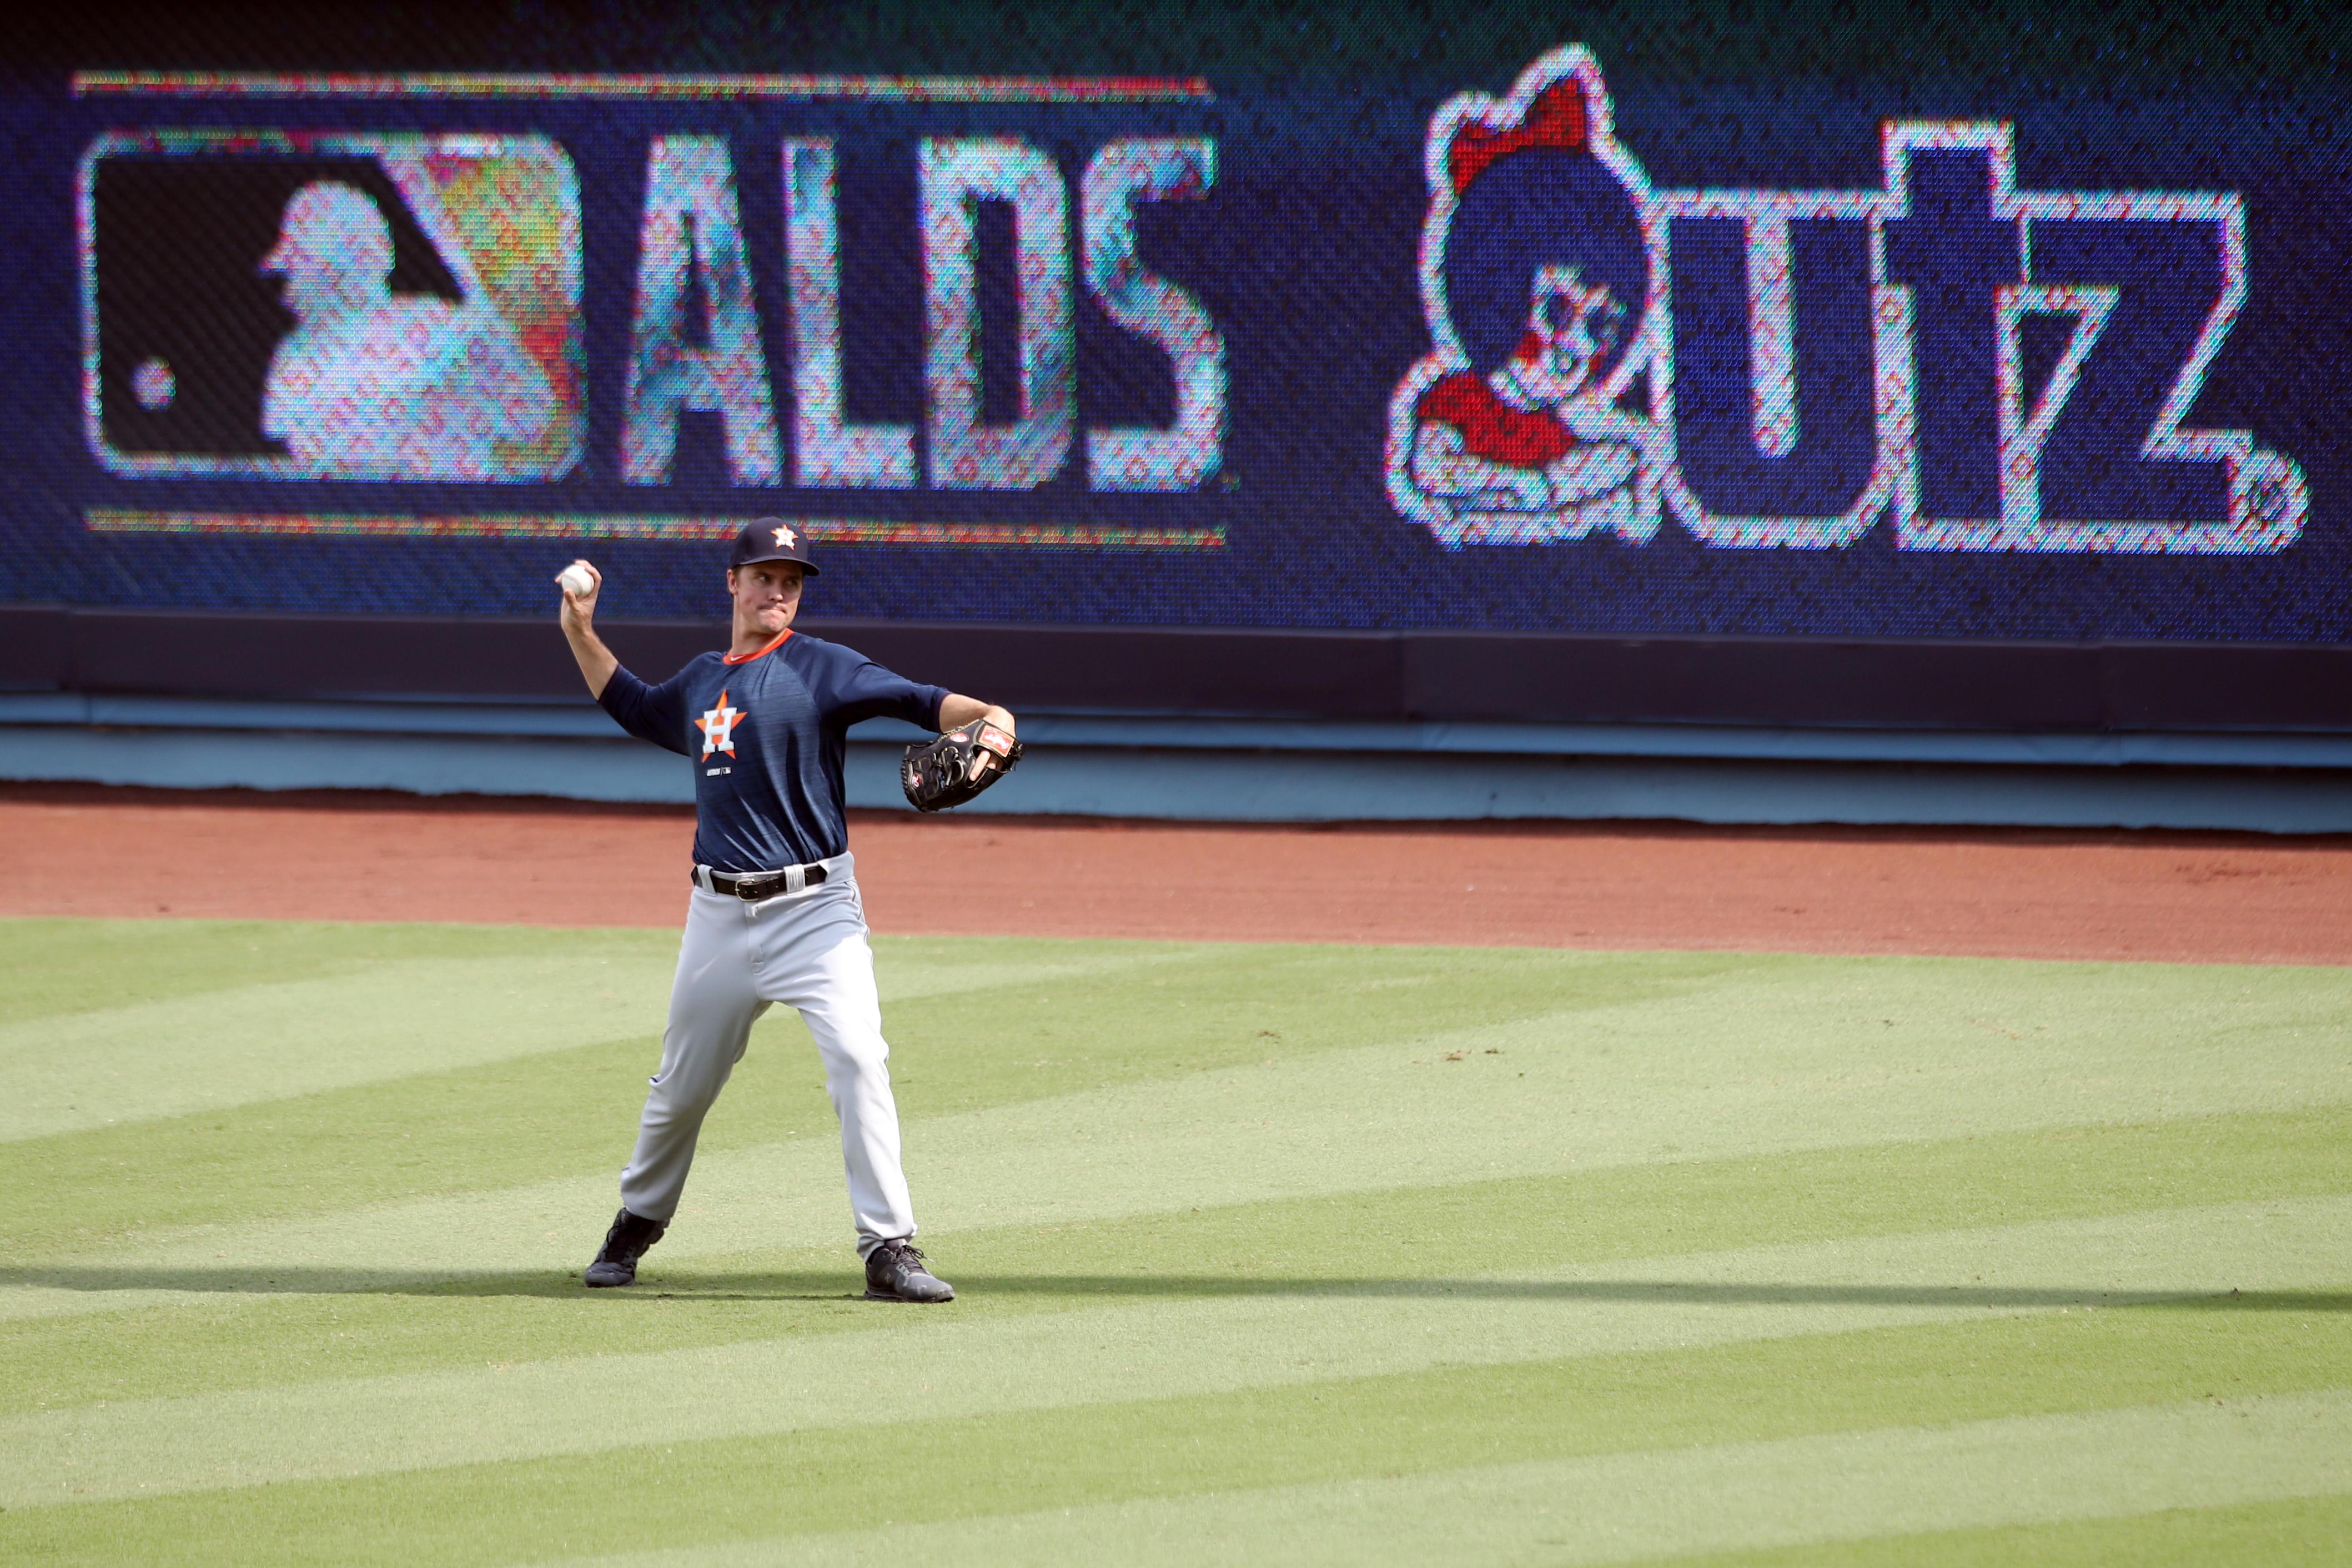 American League Divison Series Game 1: Houston Astros v. Oakland Athletics